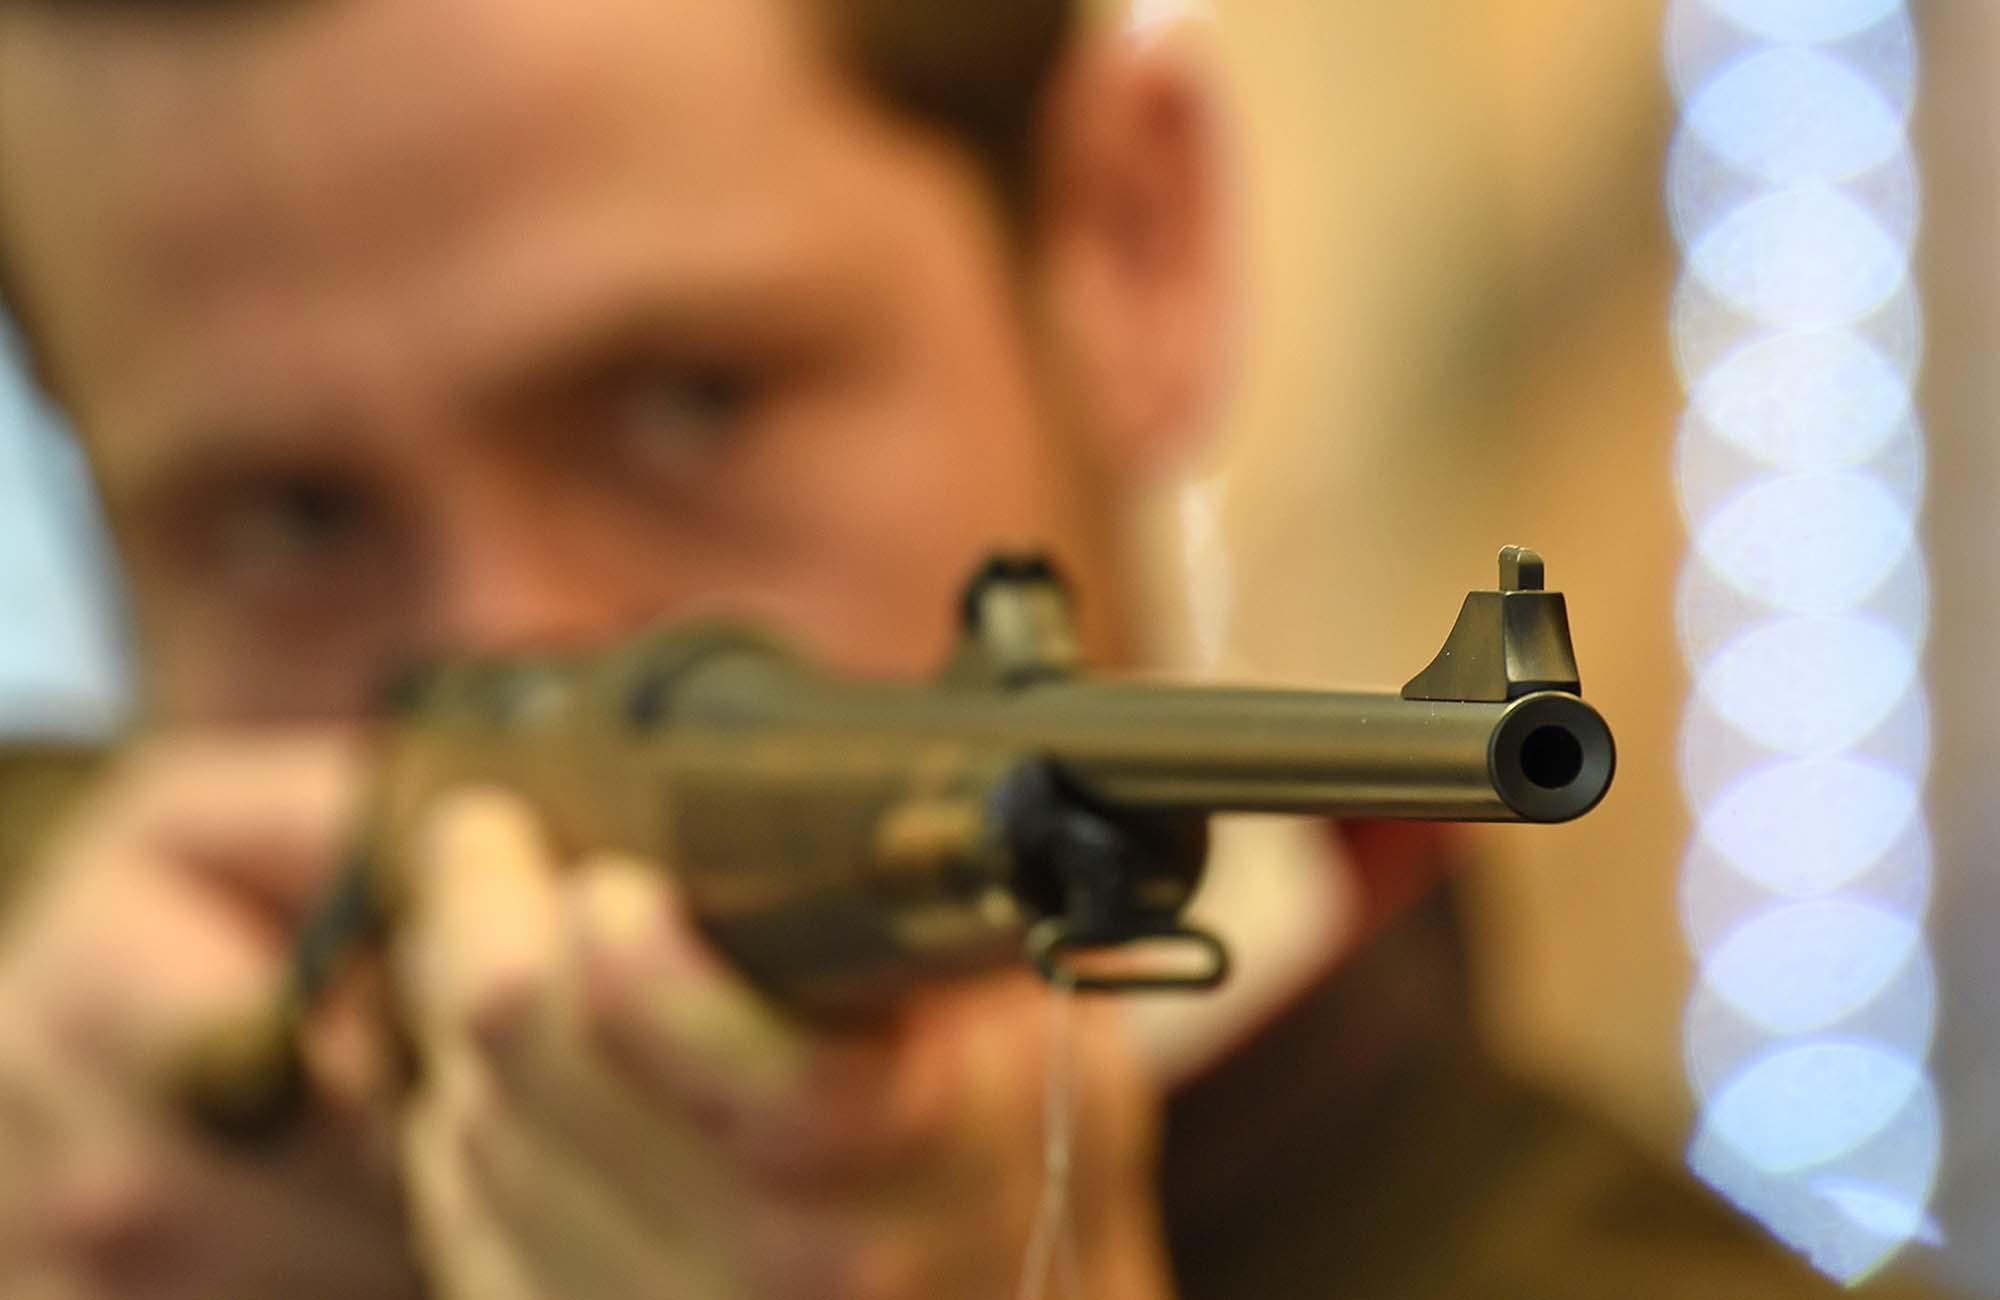 mauser m12 s manual cocking system rifle gunsweek com